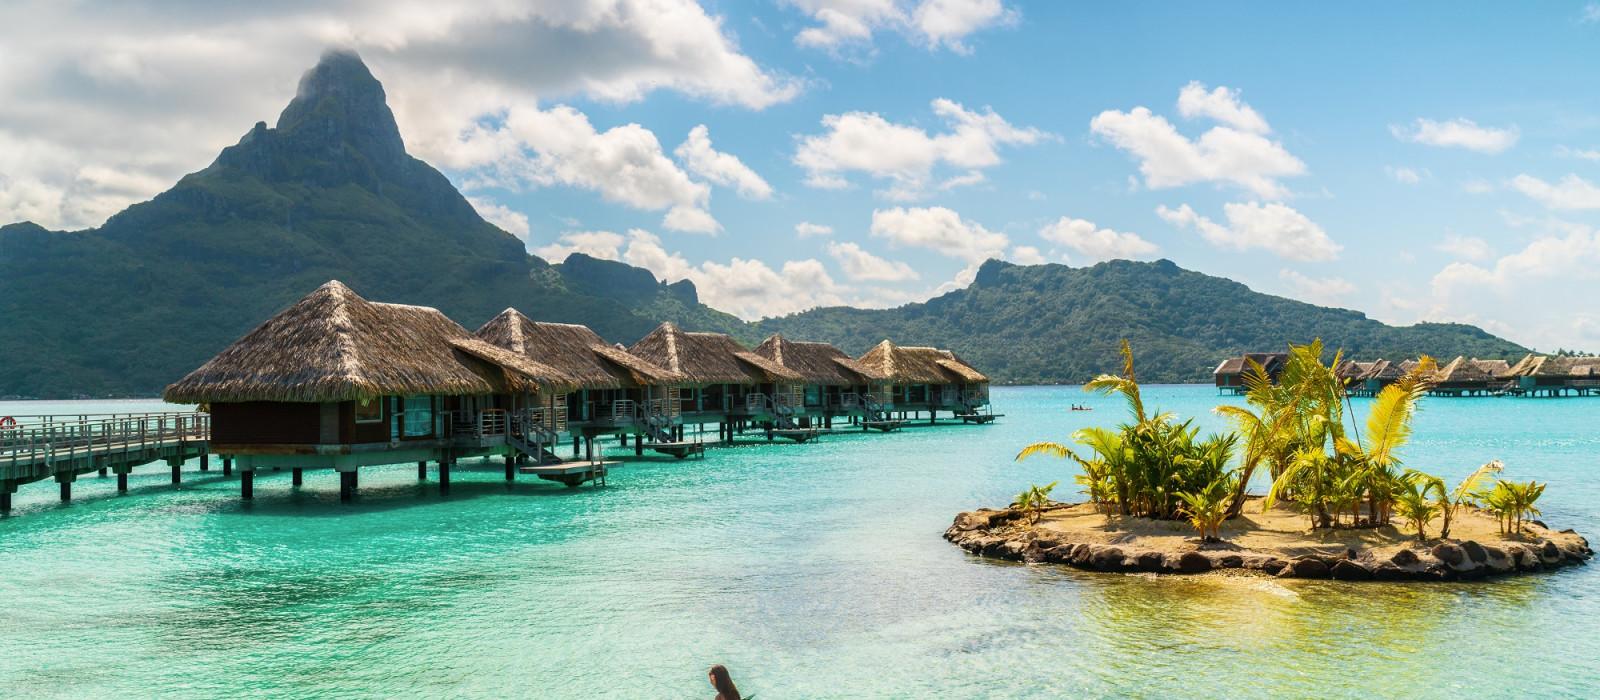 Geheimnisse des Südpazifiks – Tahiti, Bora Bora & Blaue Lagune Urlaub 1